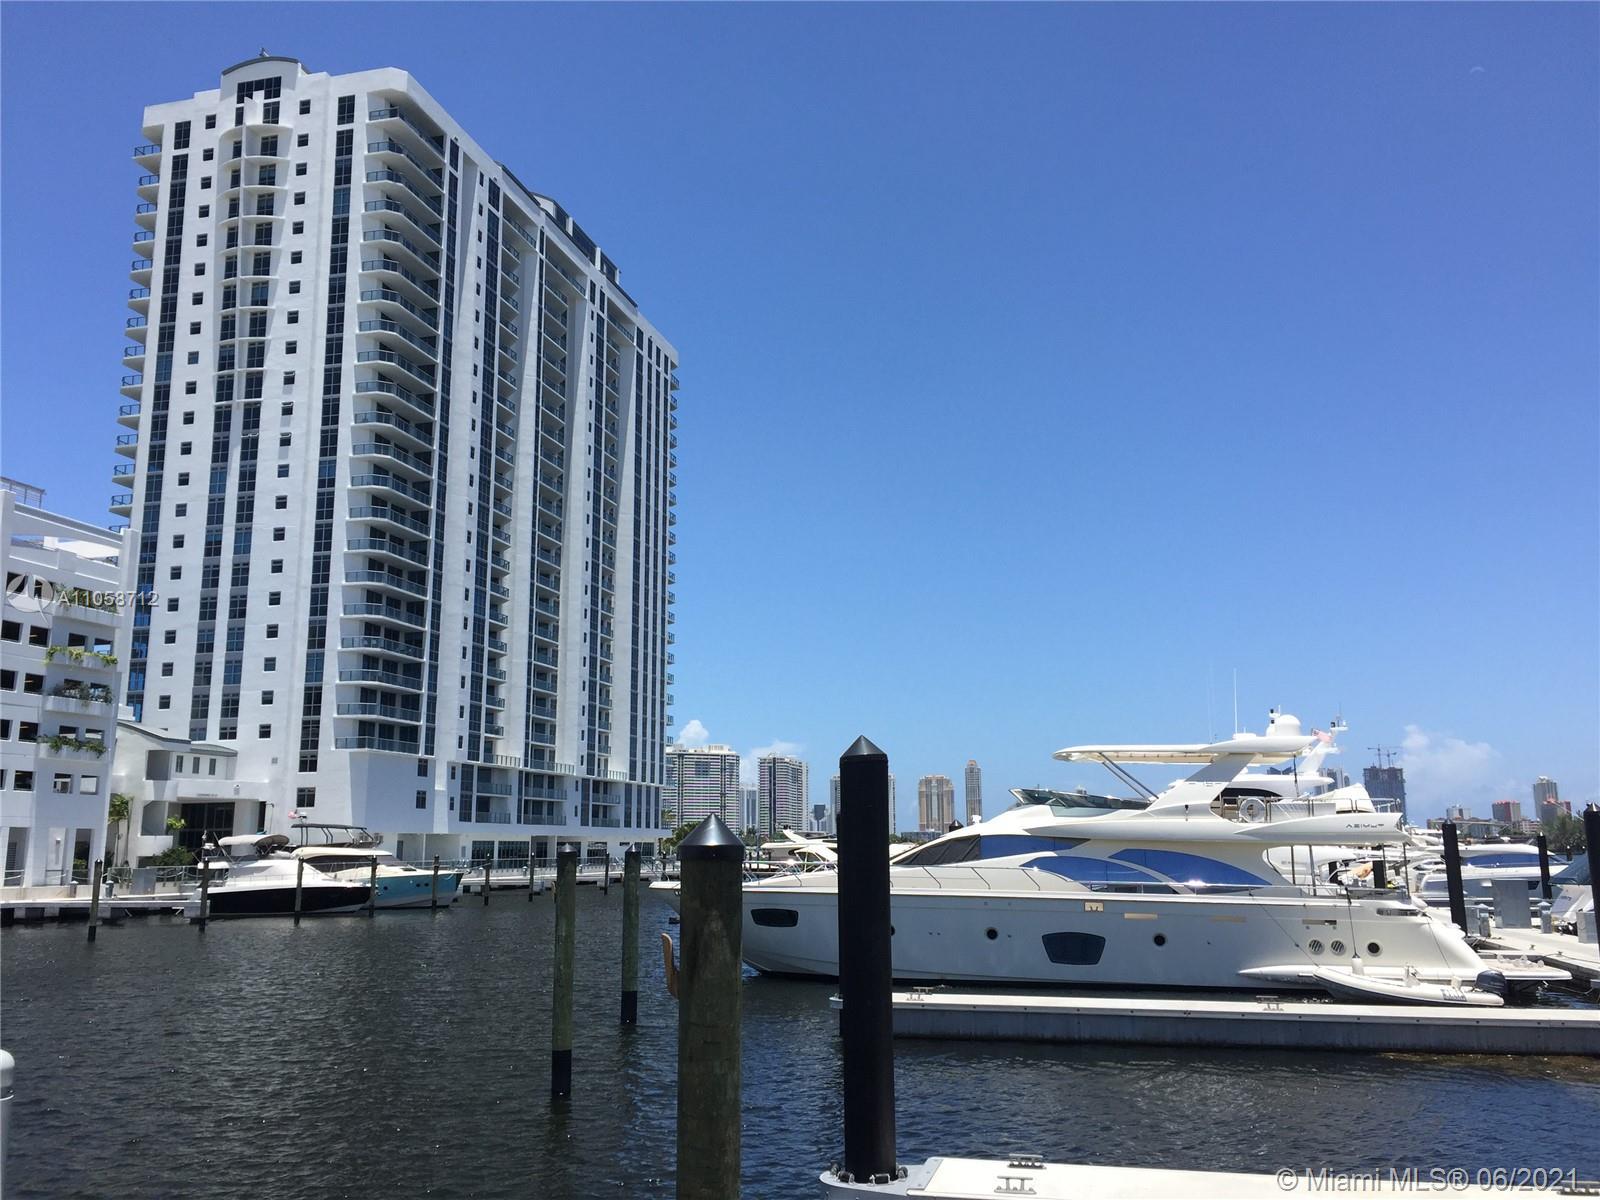 Marina Palms 2 #1906 - 17301 Biscayne Blvd #1906, North Miami Beach, FL 33160